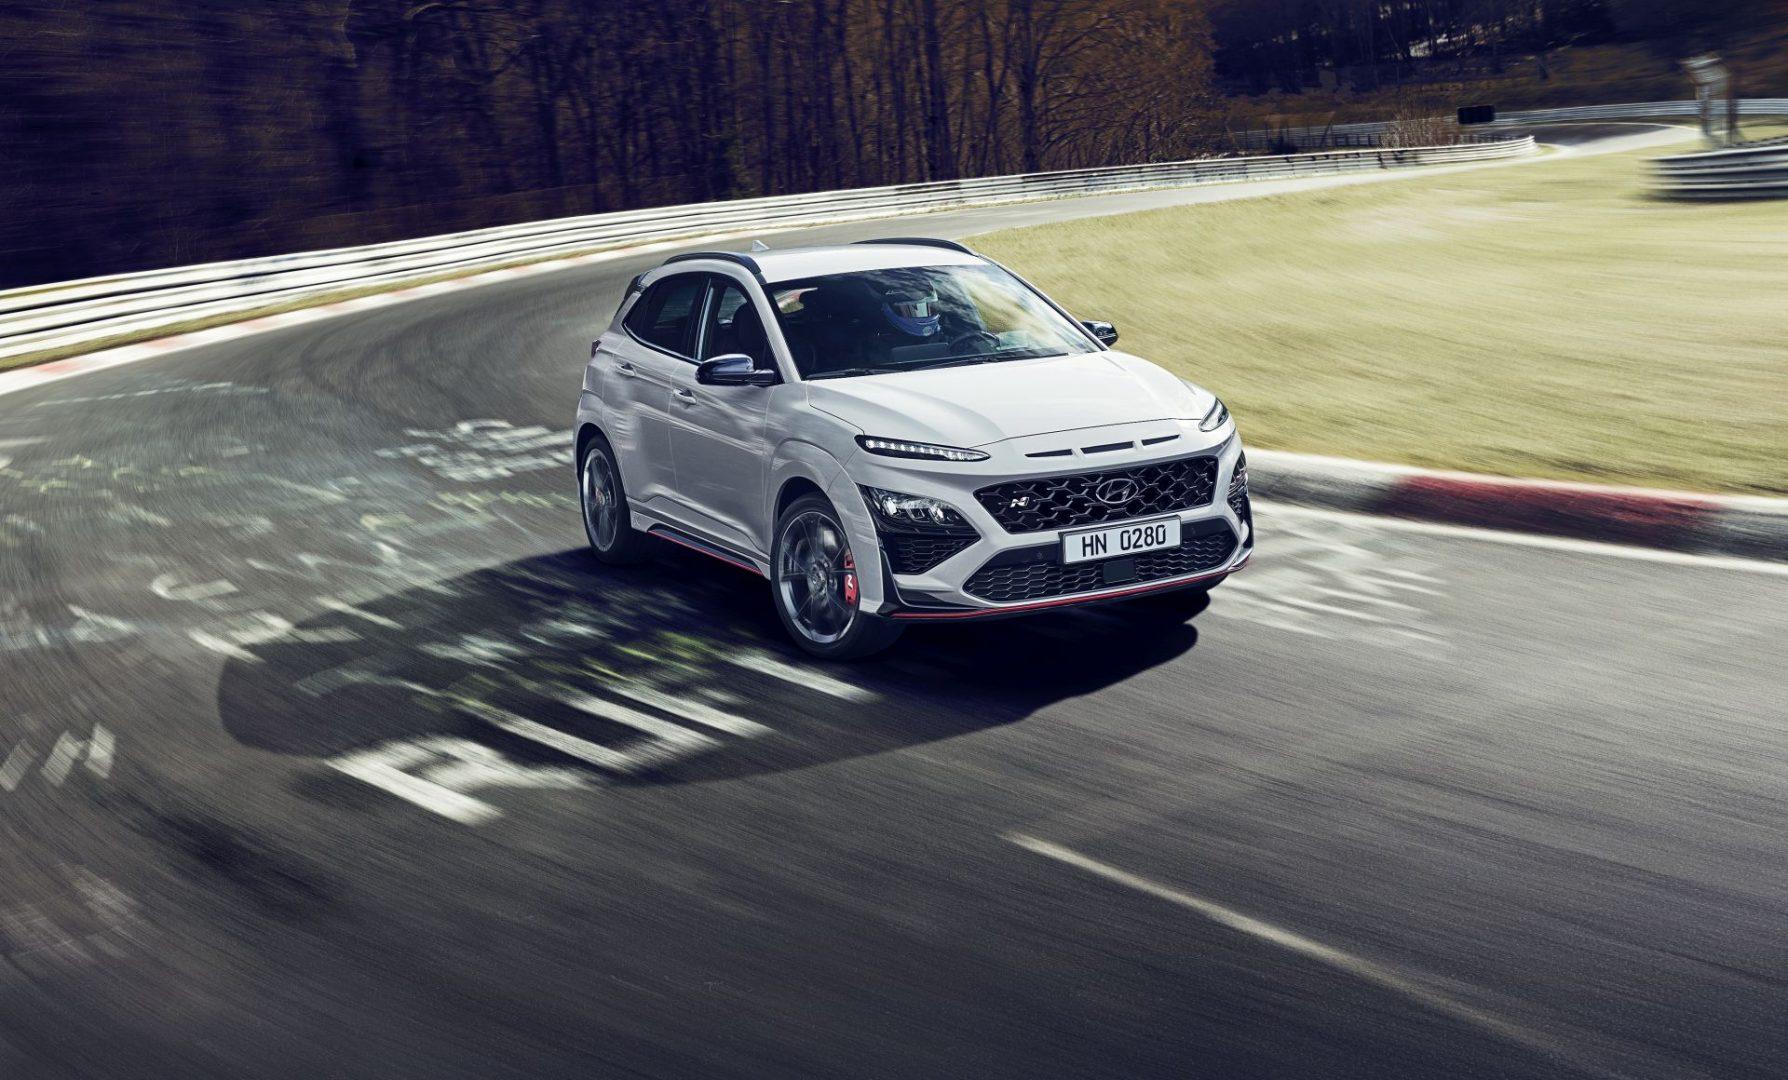 Otkrivene sve tajne sportskog SUV-a Hyundai Kona N s 280 KS